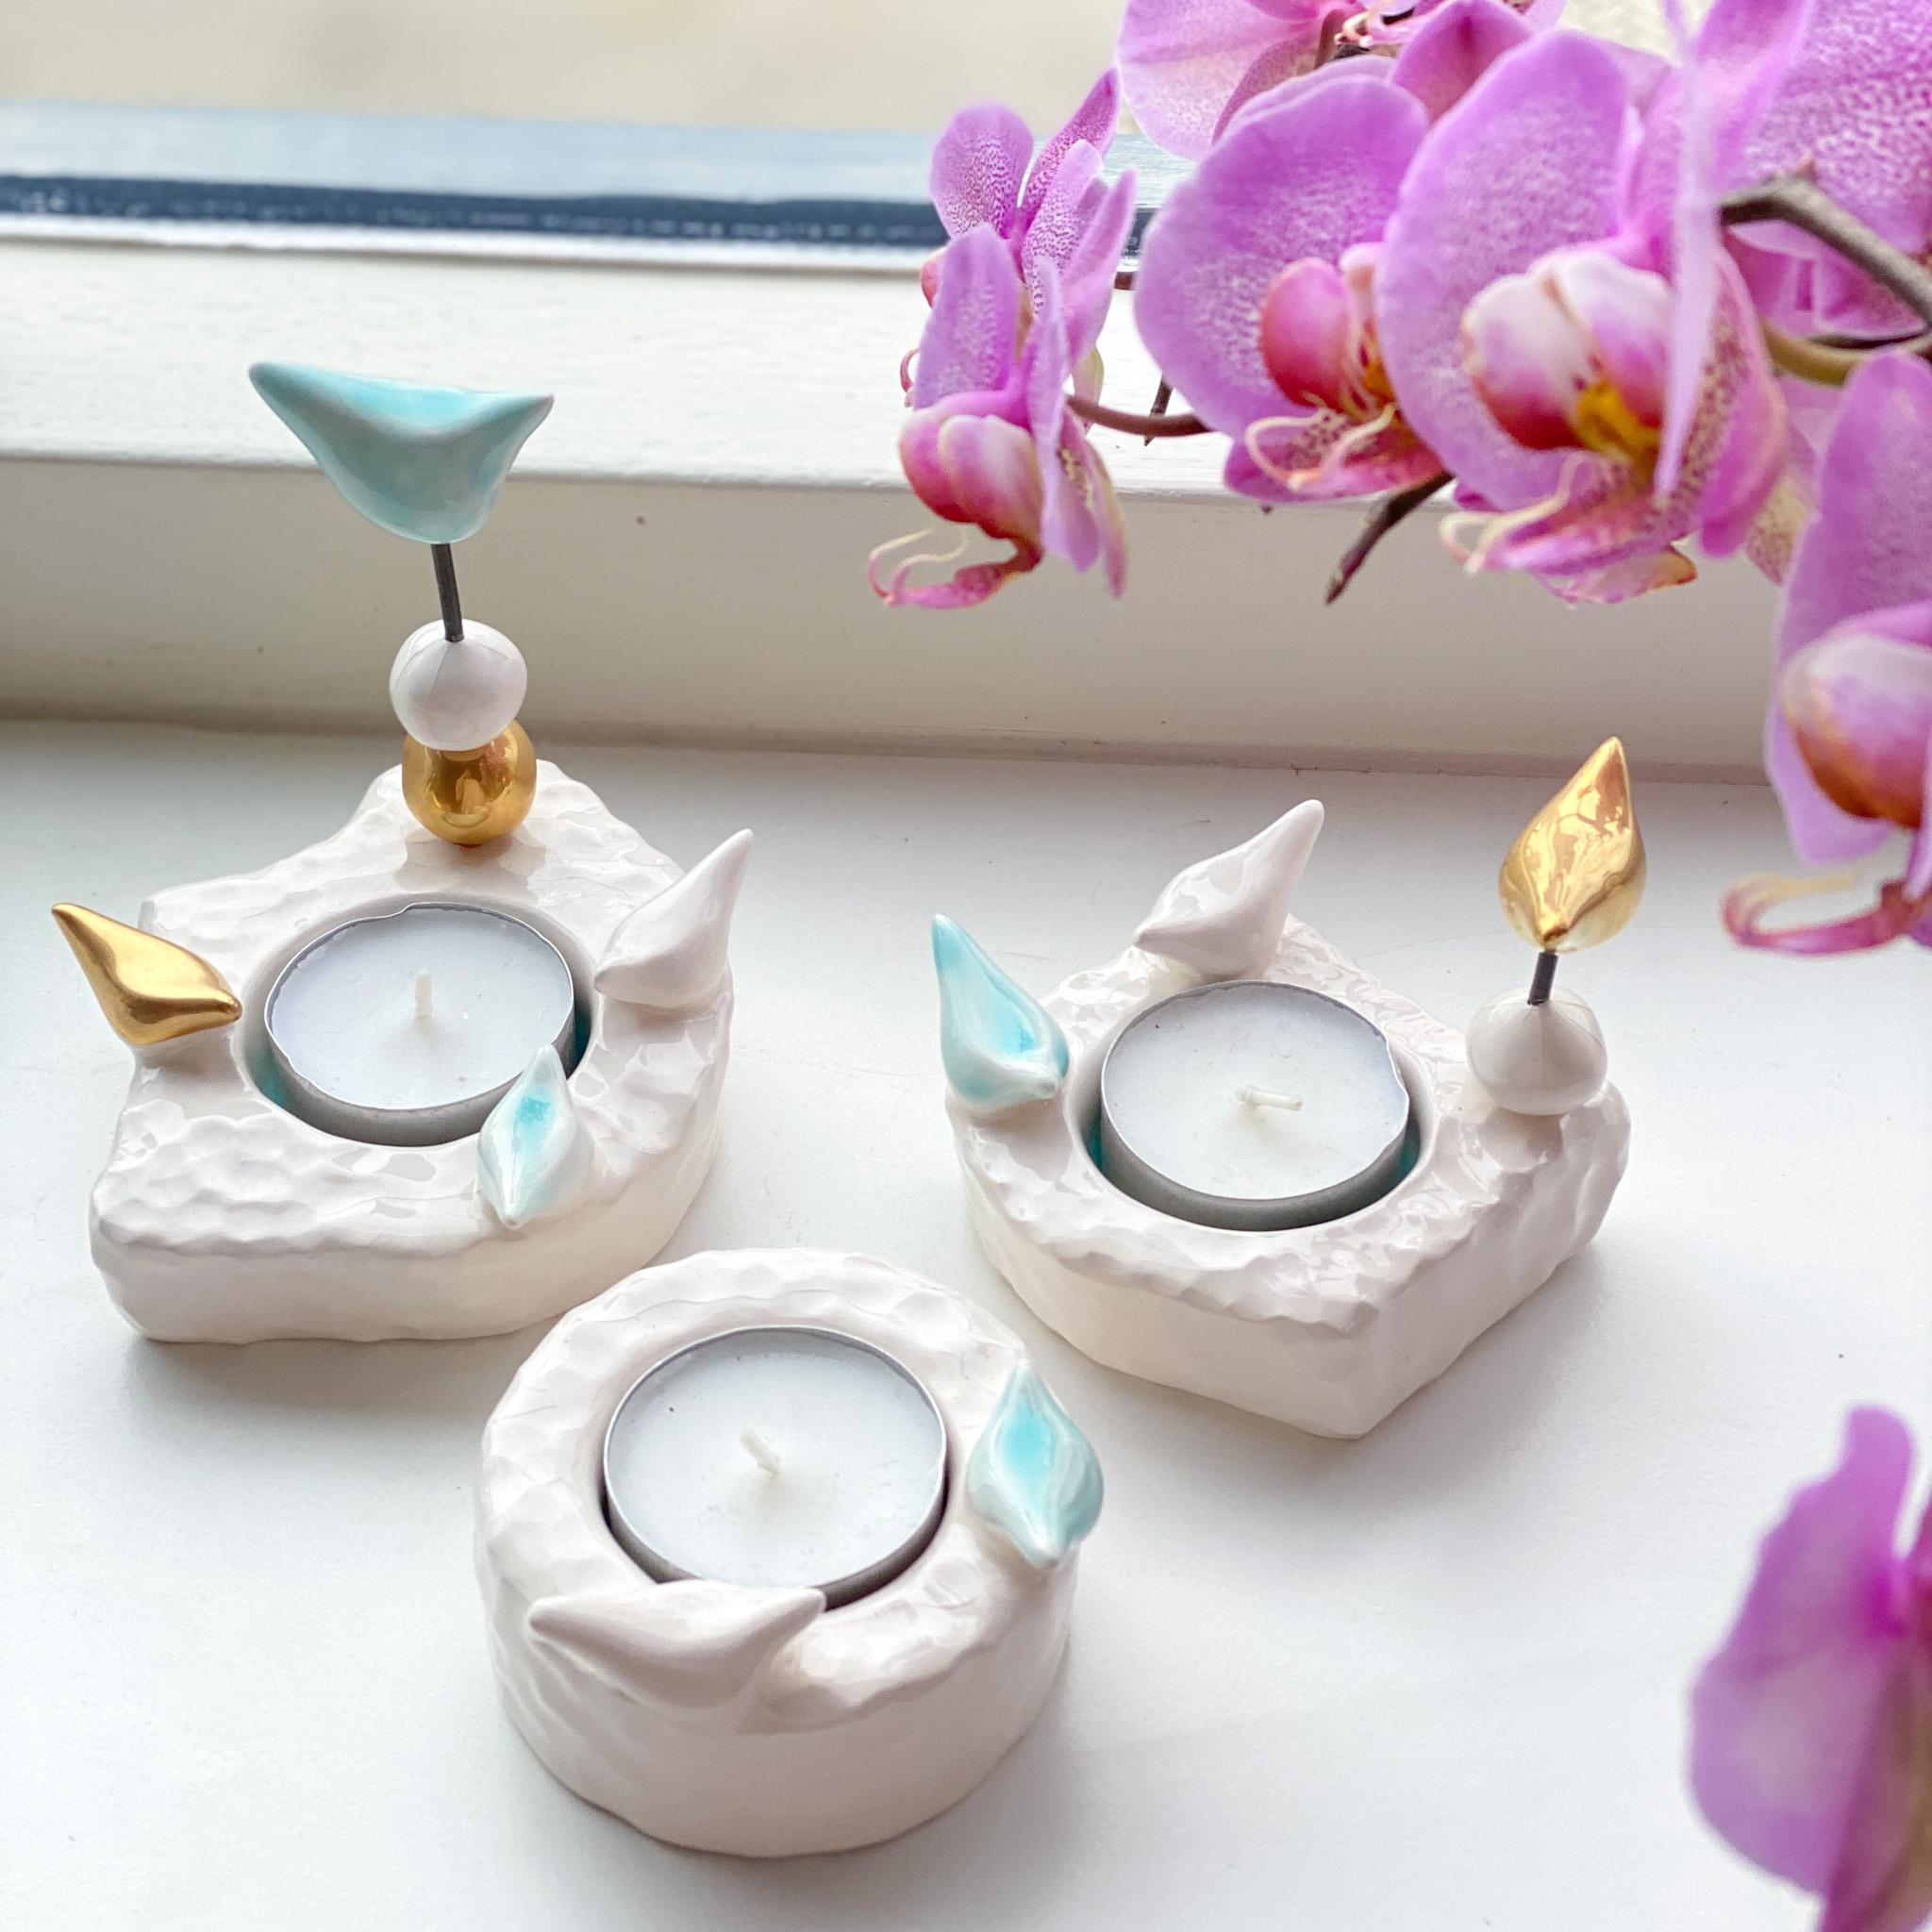 Farnegar handmade candelabras Blue( available in 3 sizes)